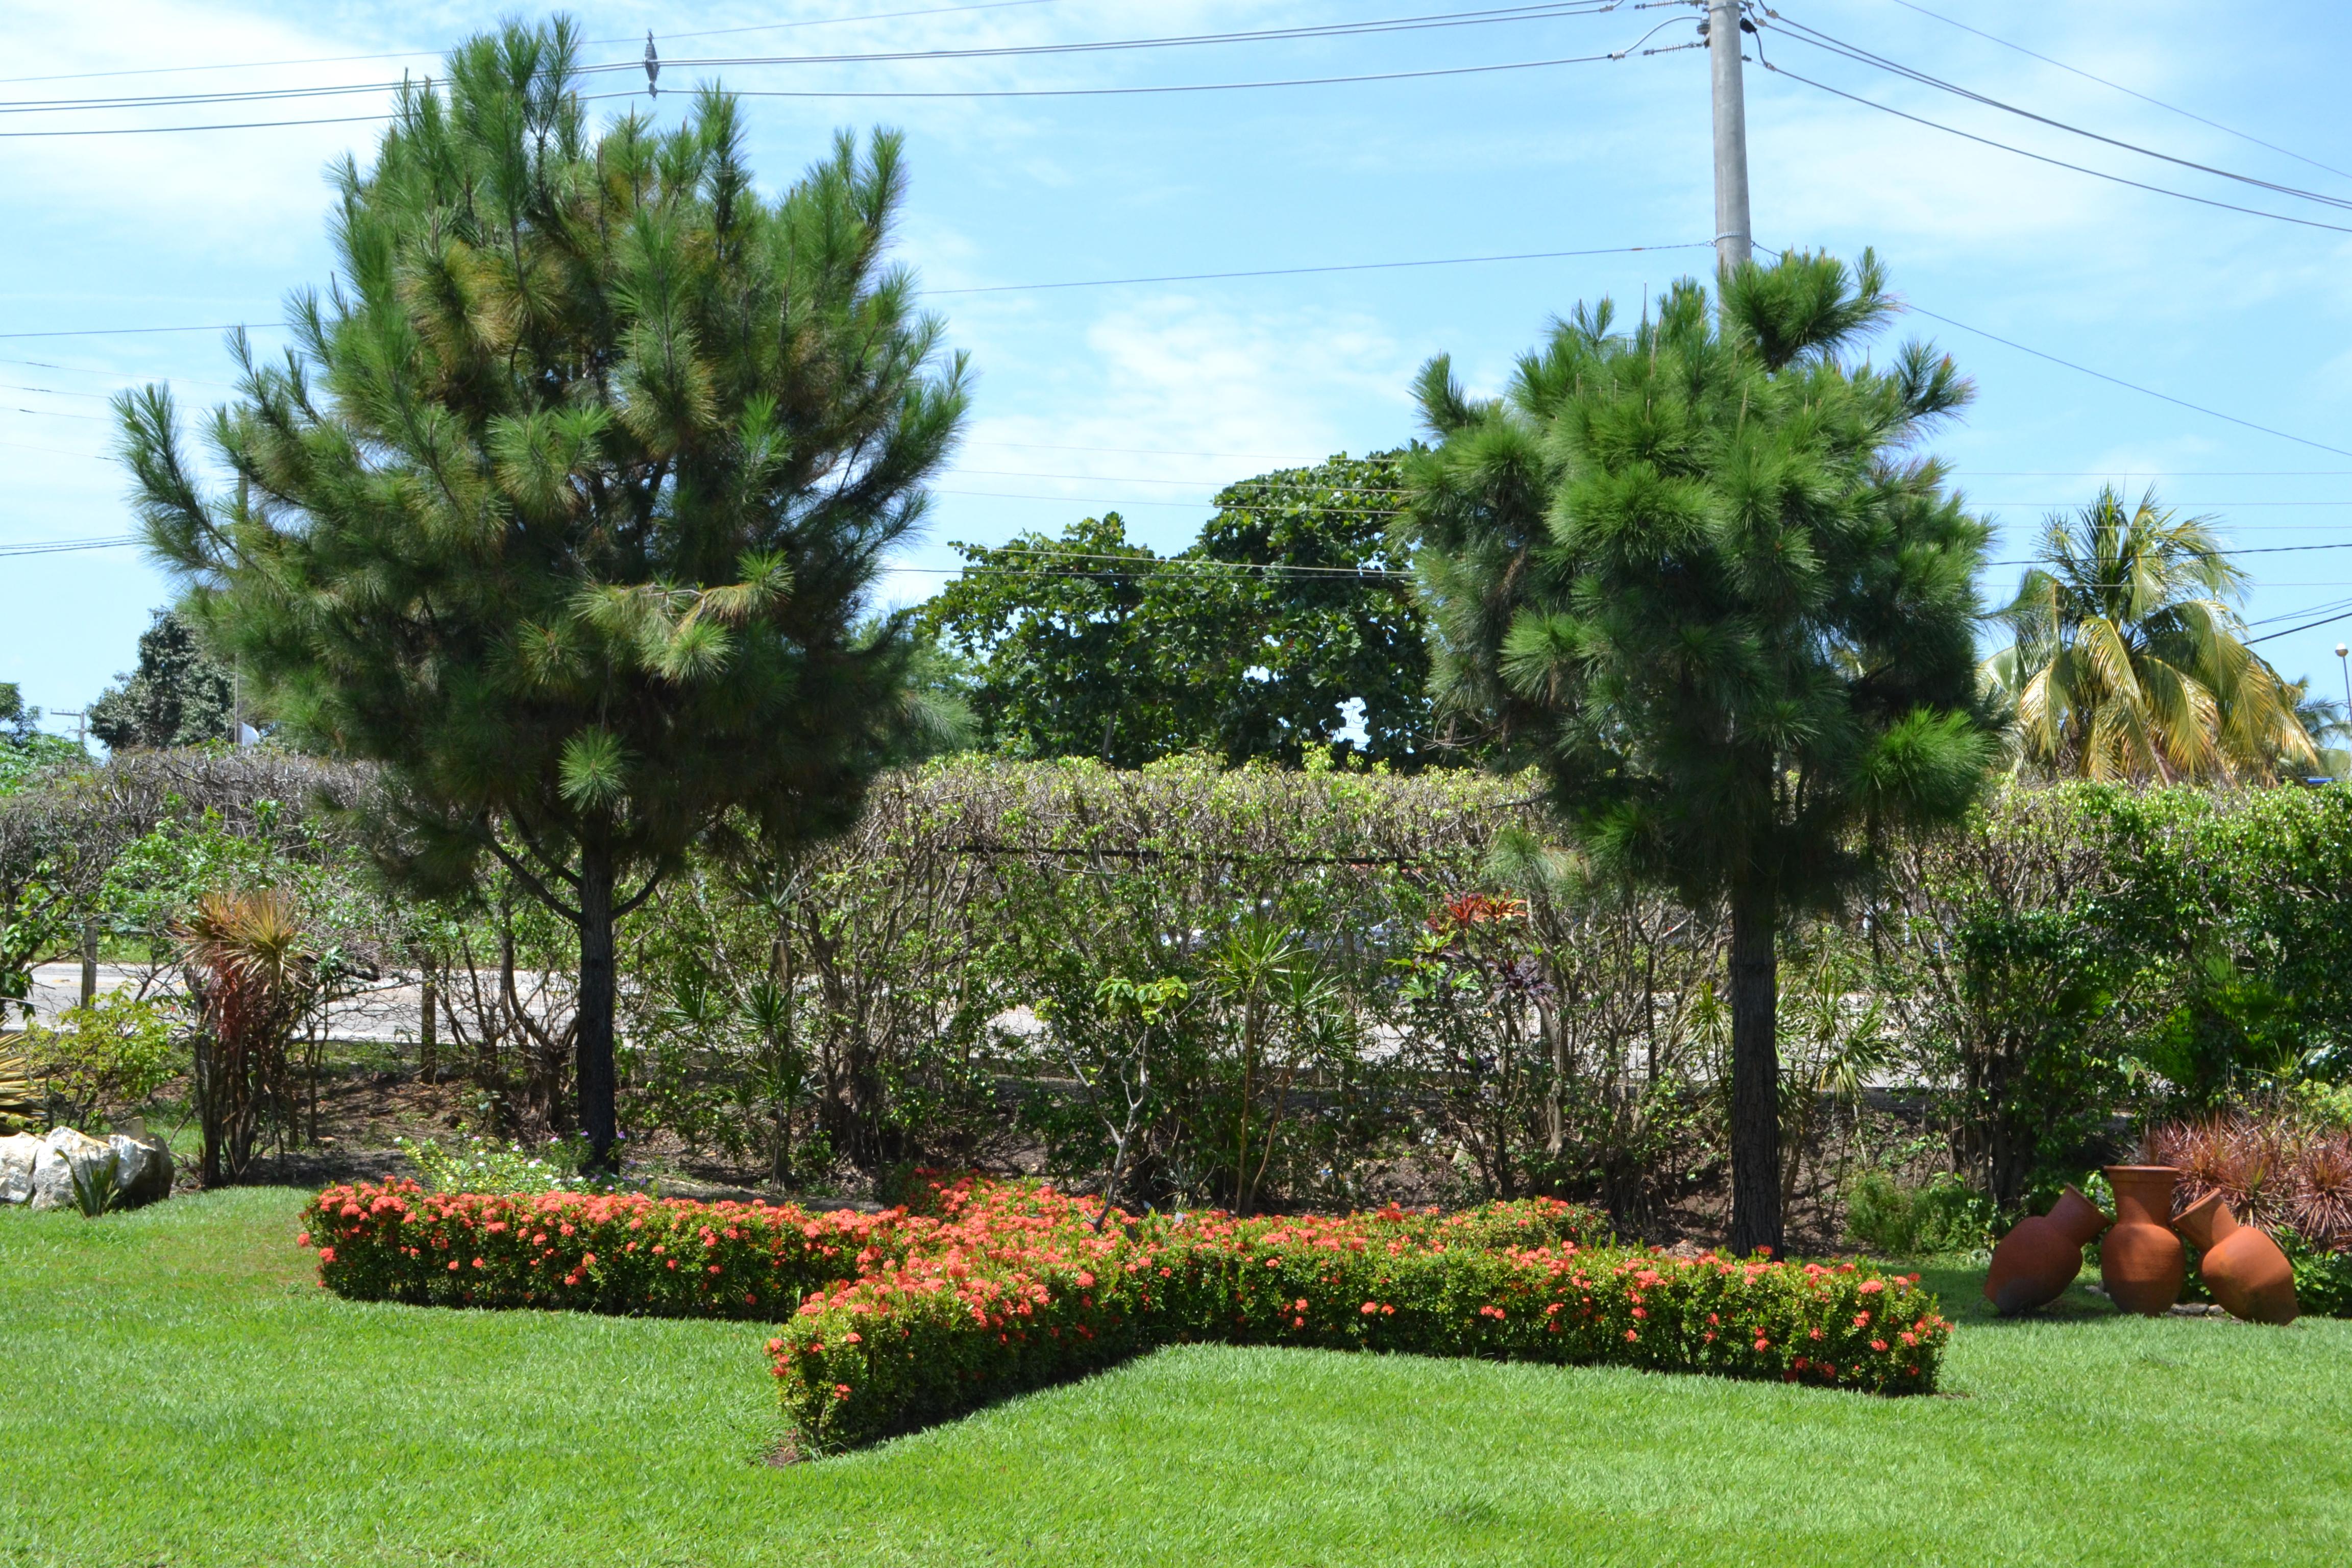 Alberi sempreverdi per giardino - Alberi ornamentali per giardino ...